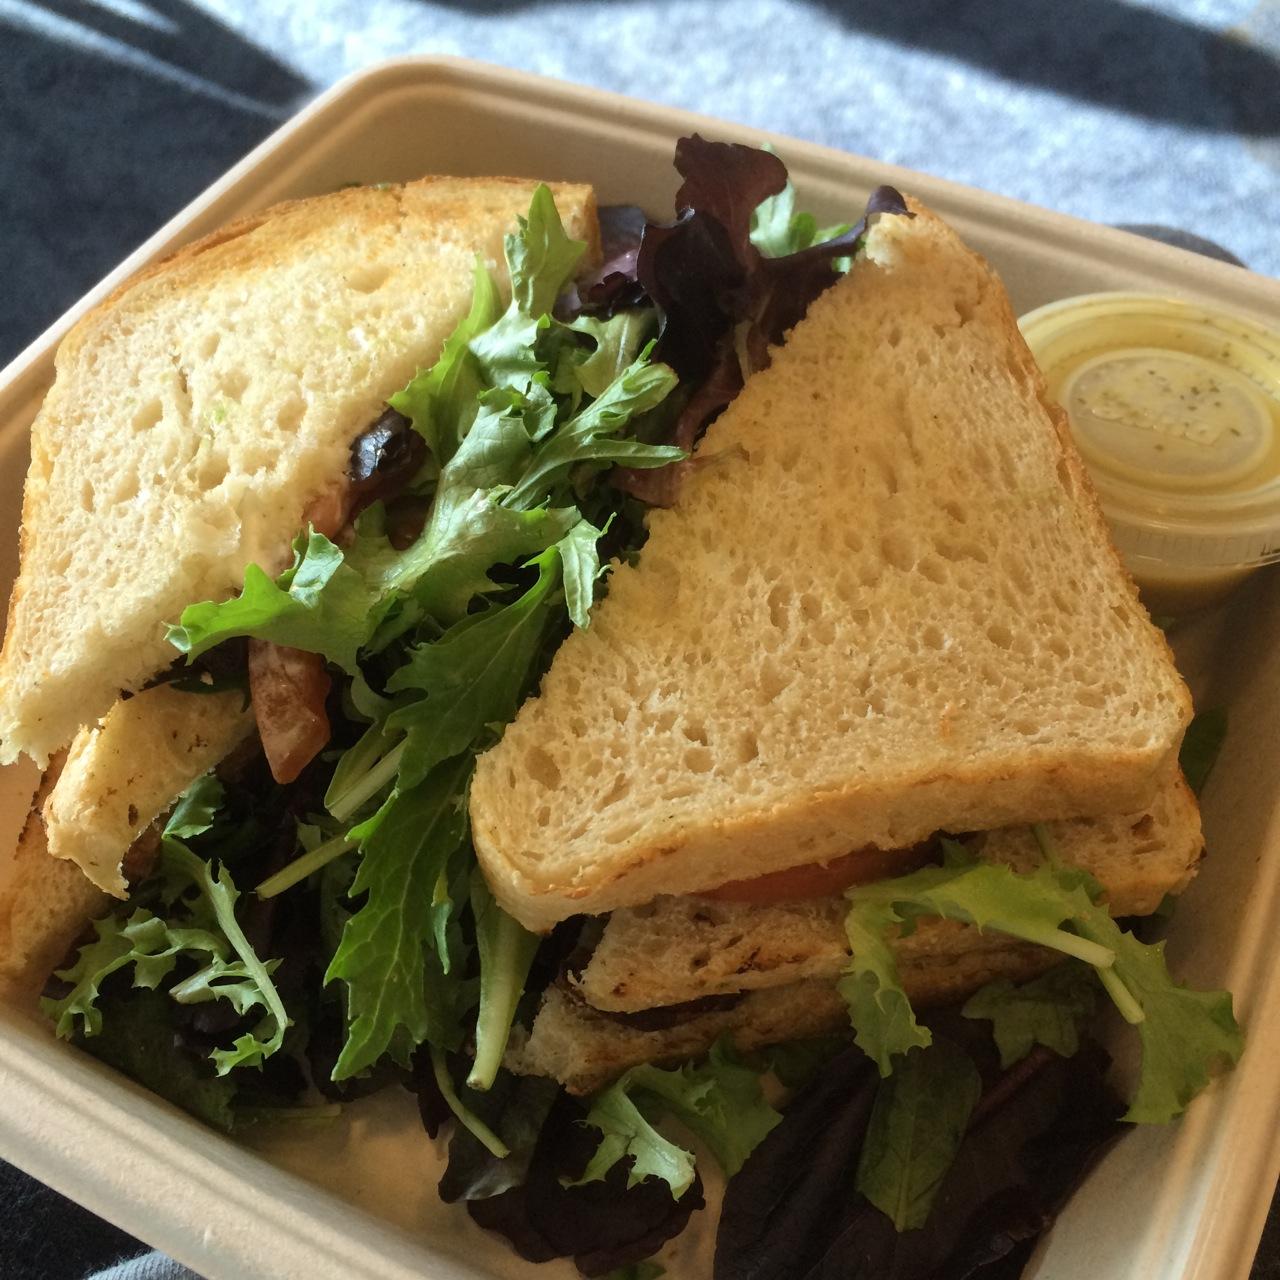 http://i2.wp.com/fatgayvegan.com/wp-content/uploads/2015/06/vegan-club-sandwich-real-food-daily.jpg?fit=1280%2C1280